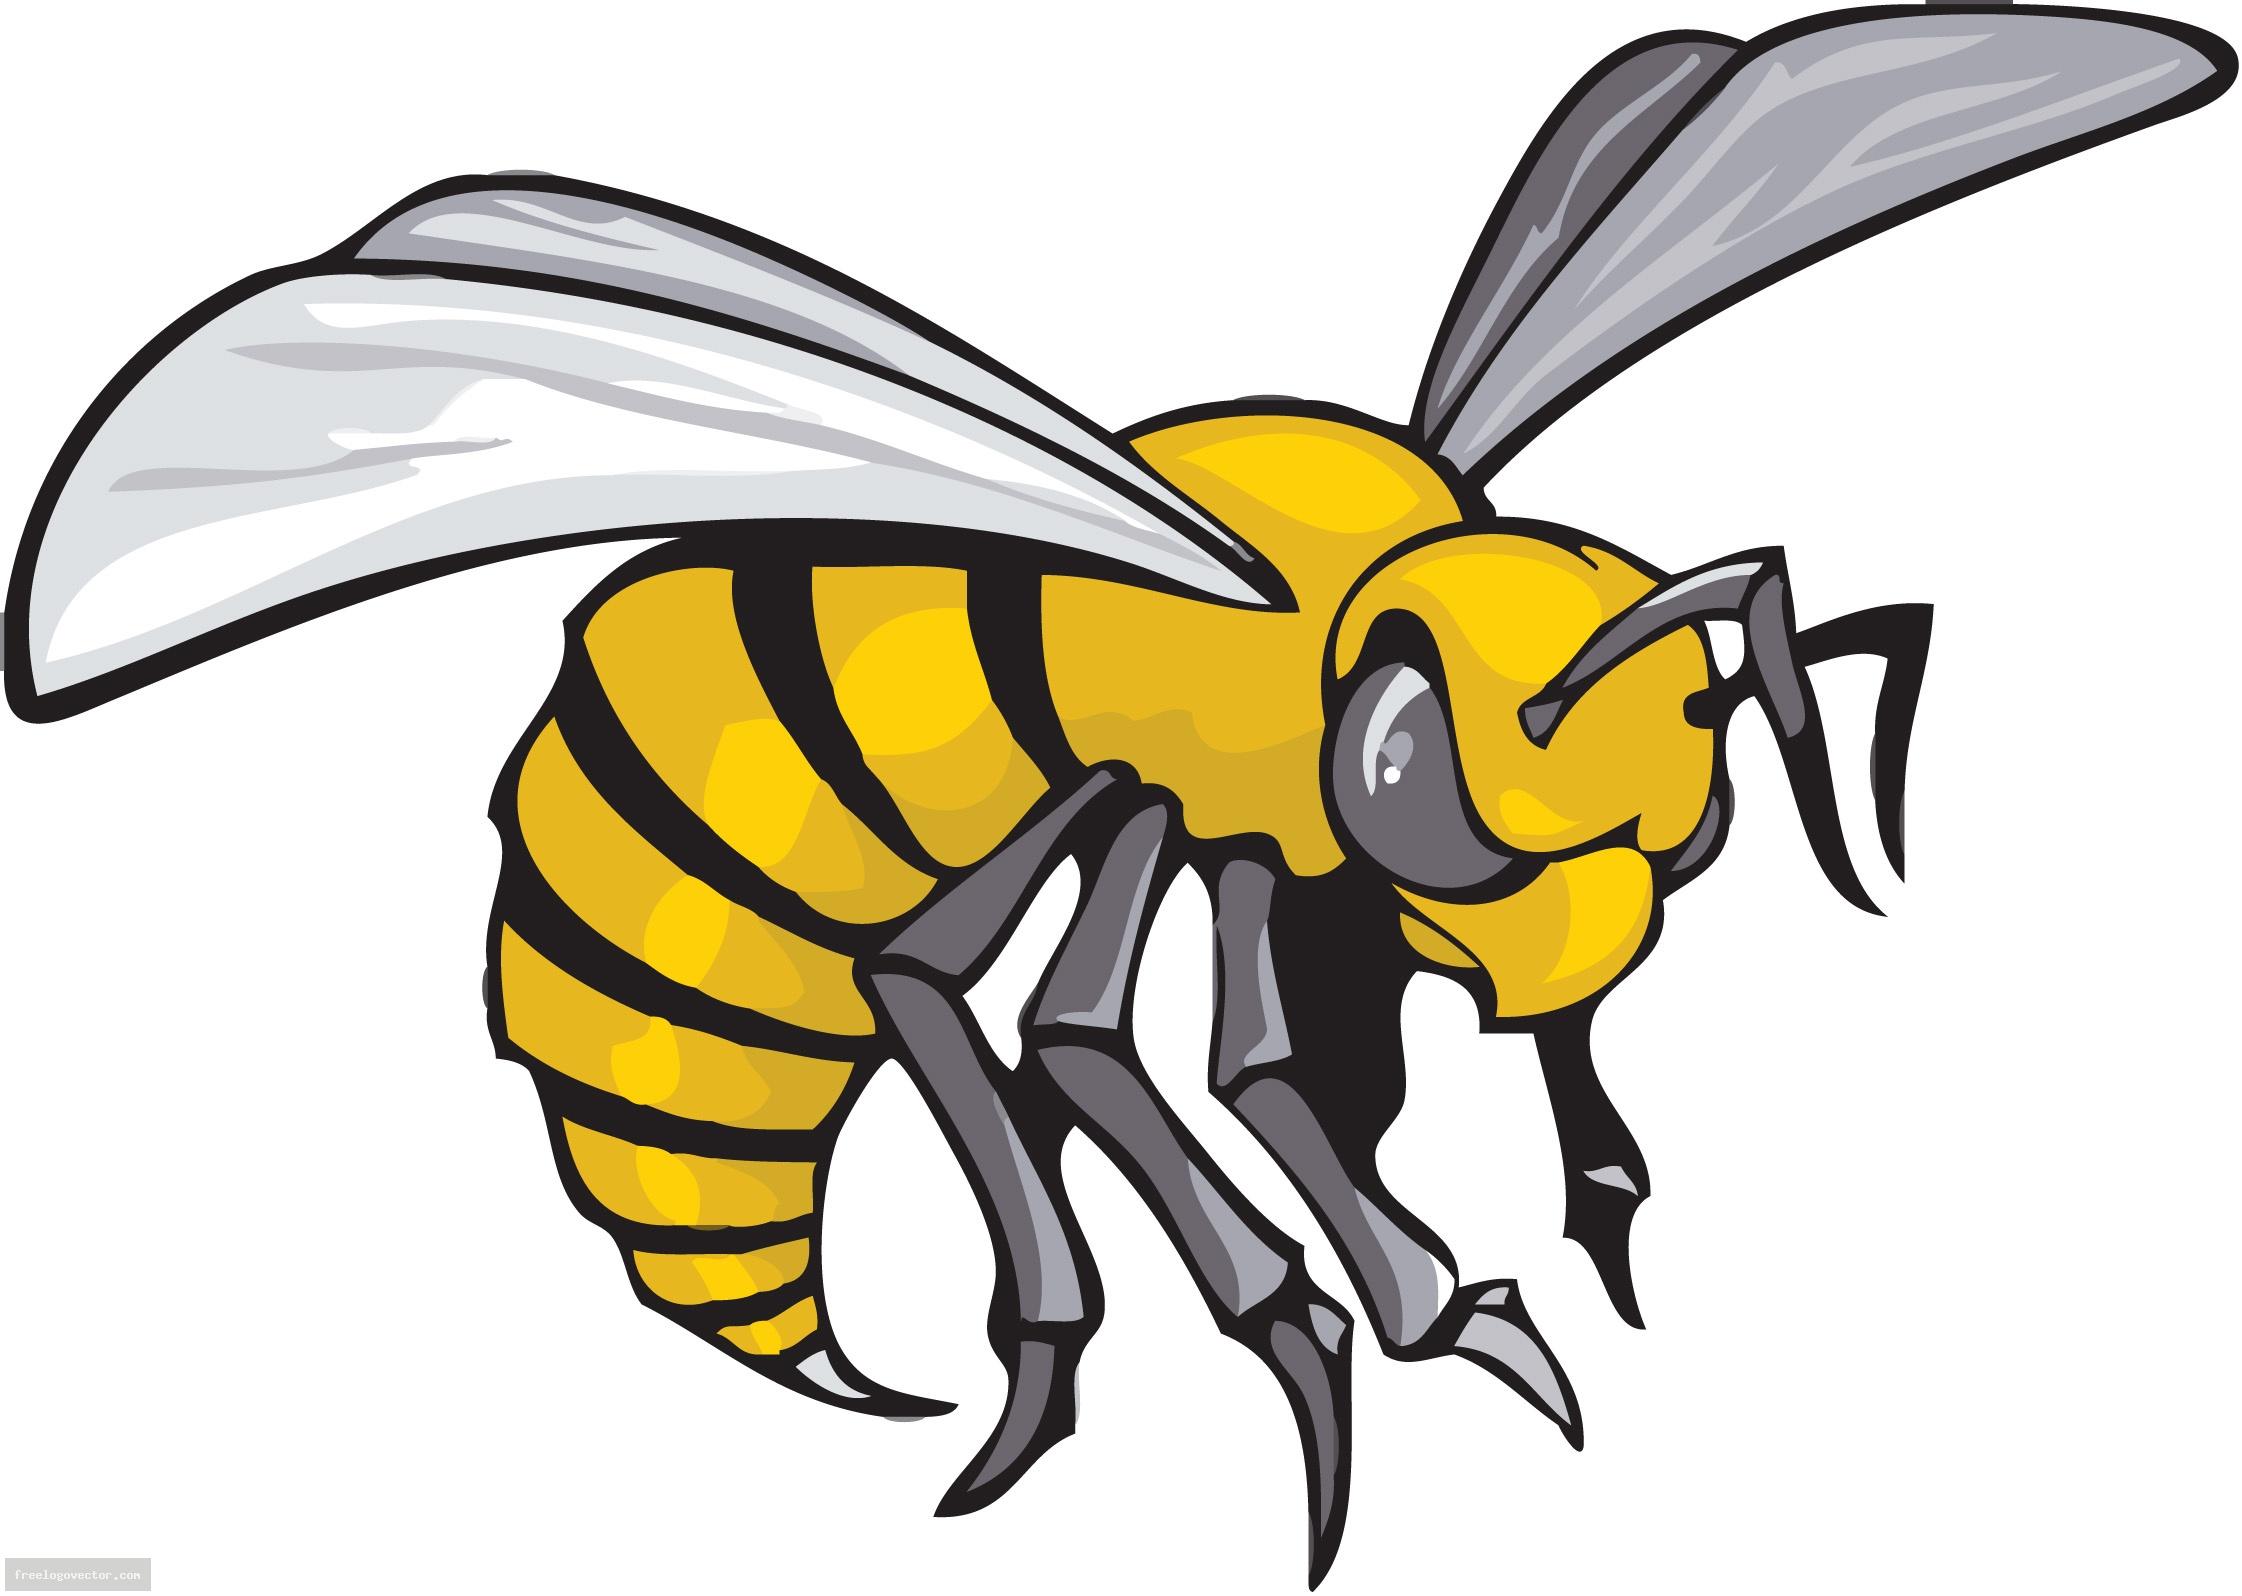 Hornet Mascot Clipart.